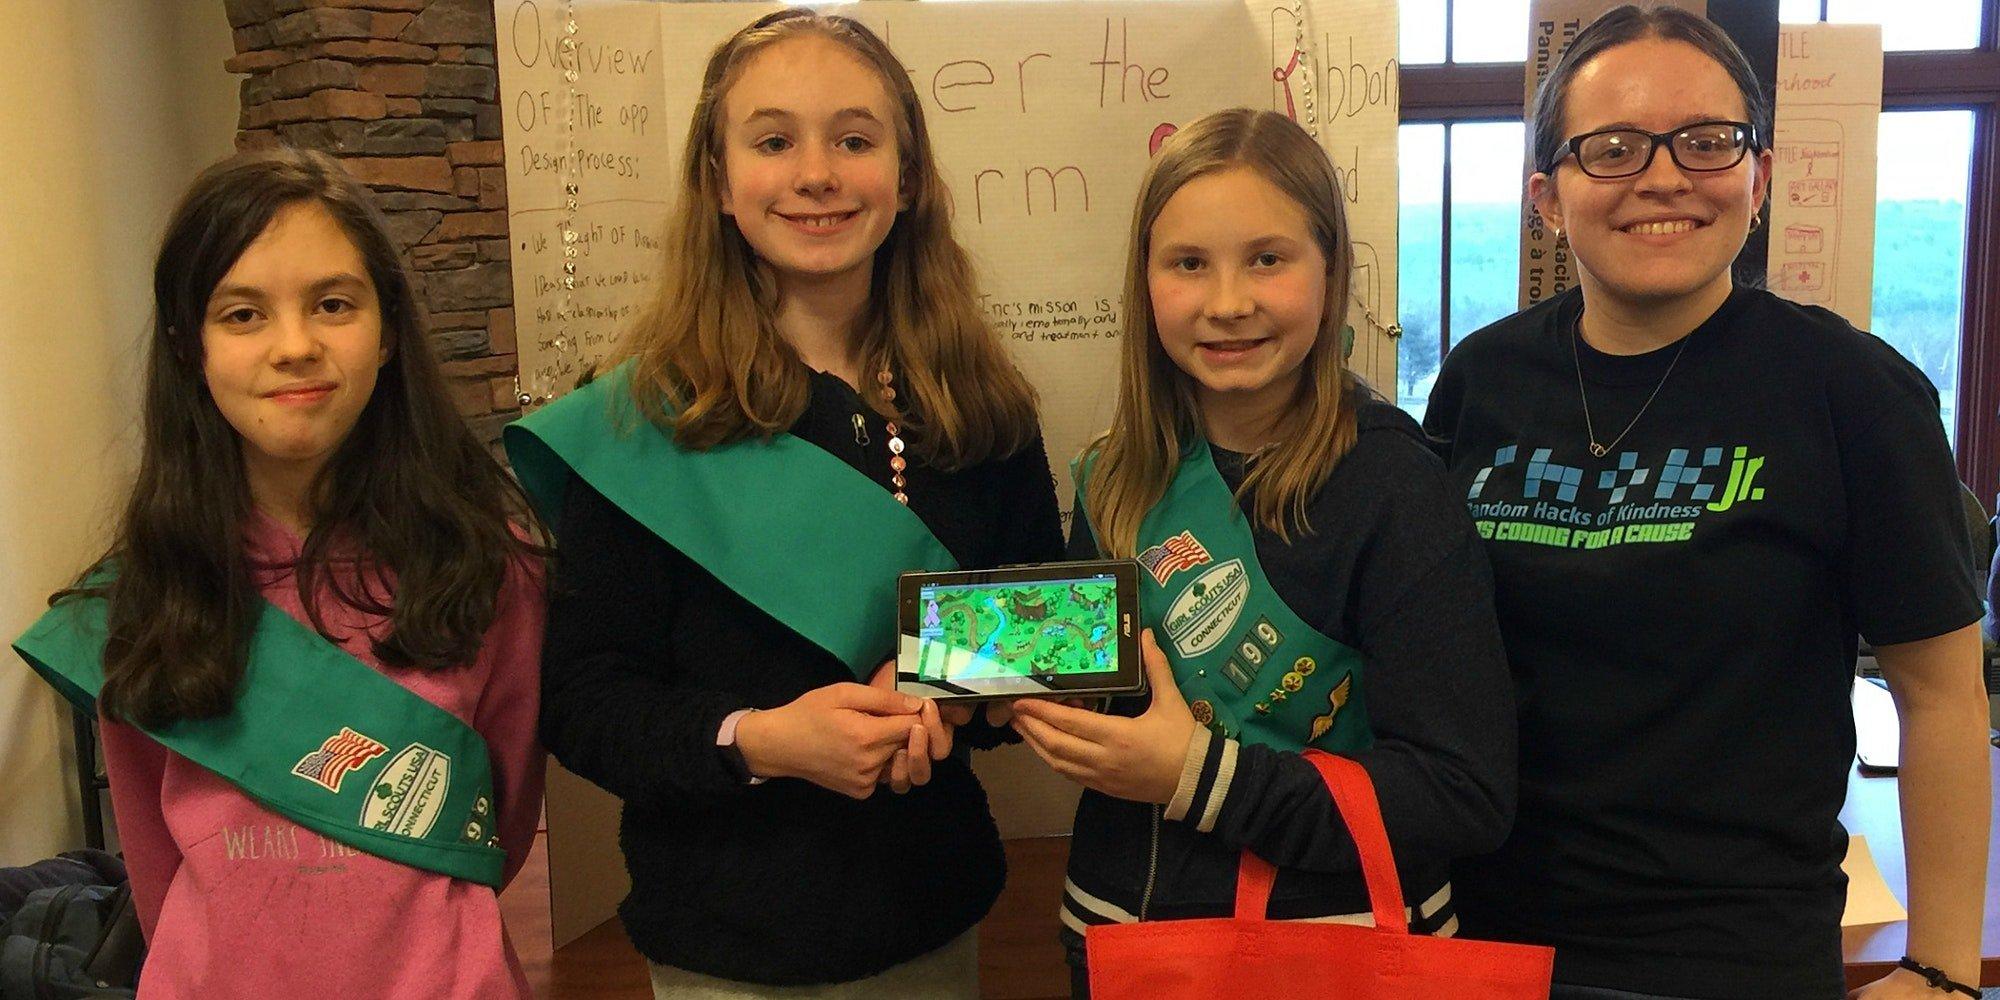 CT Girl Scouts at RHoKJr Hackathon